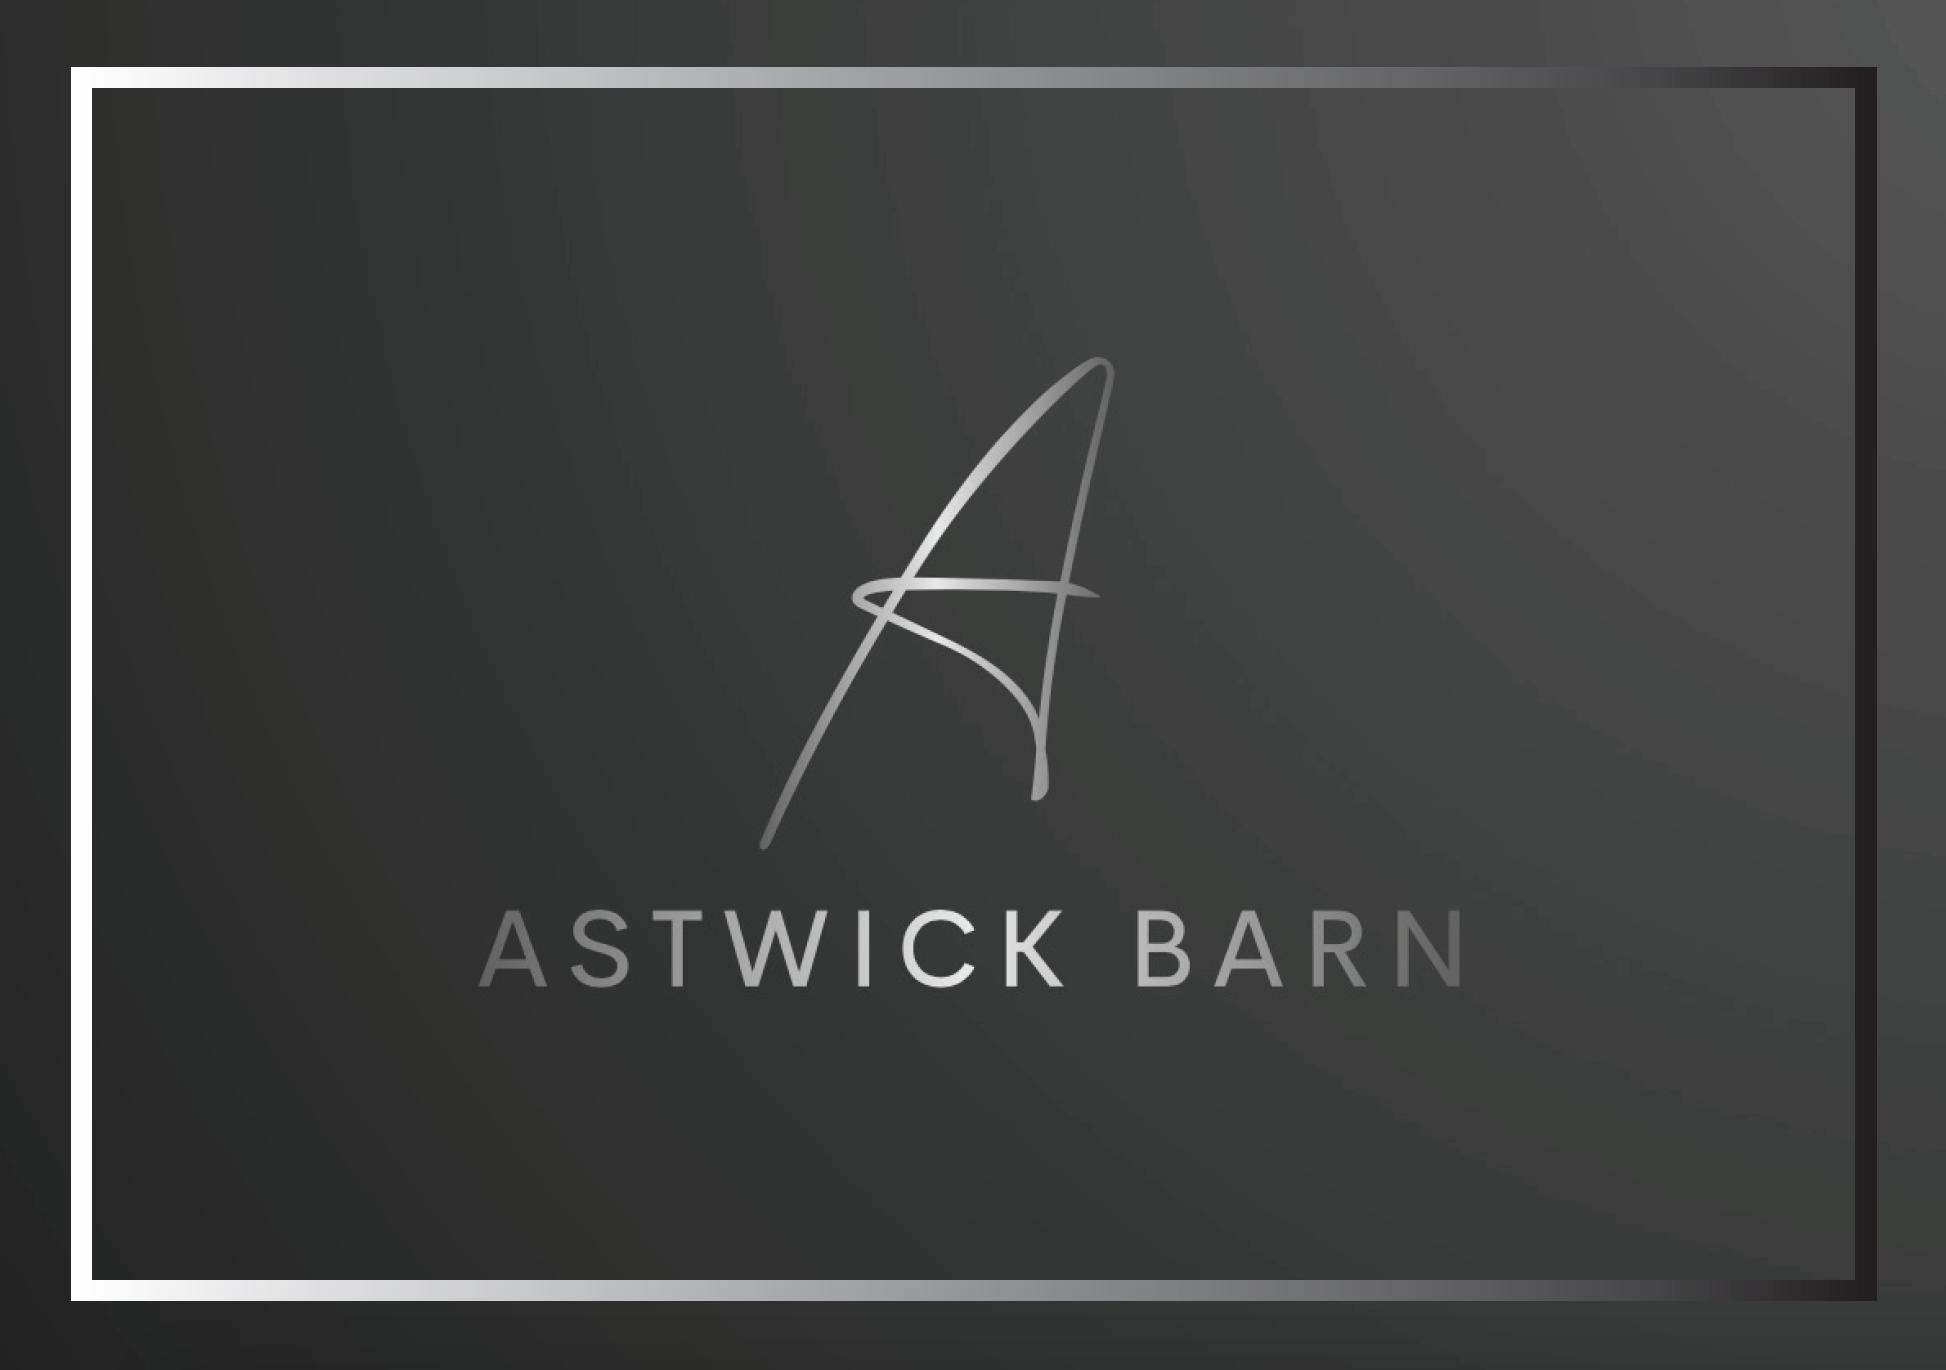 Astwick Barn